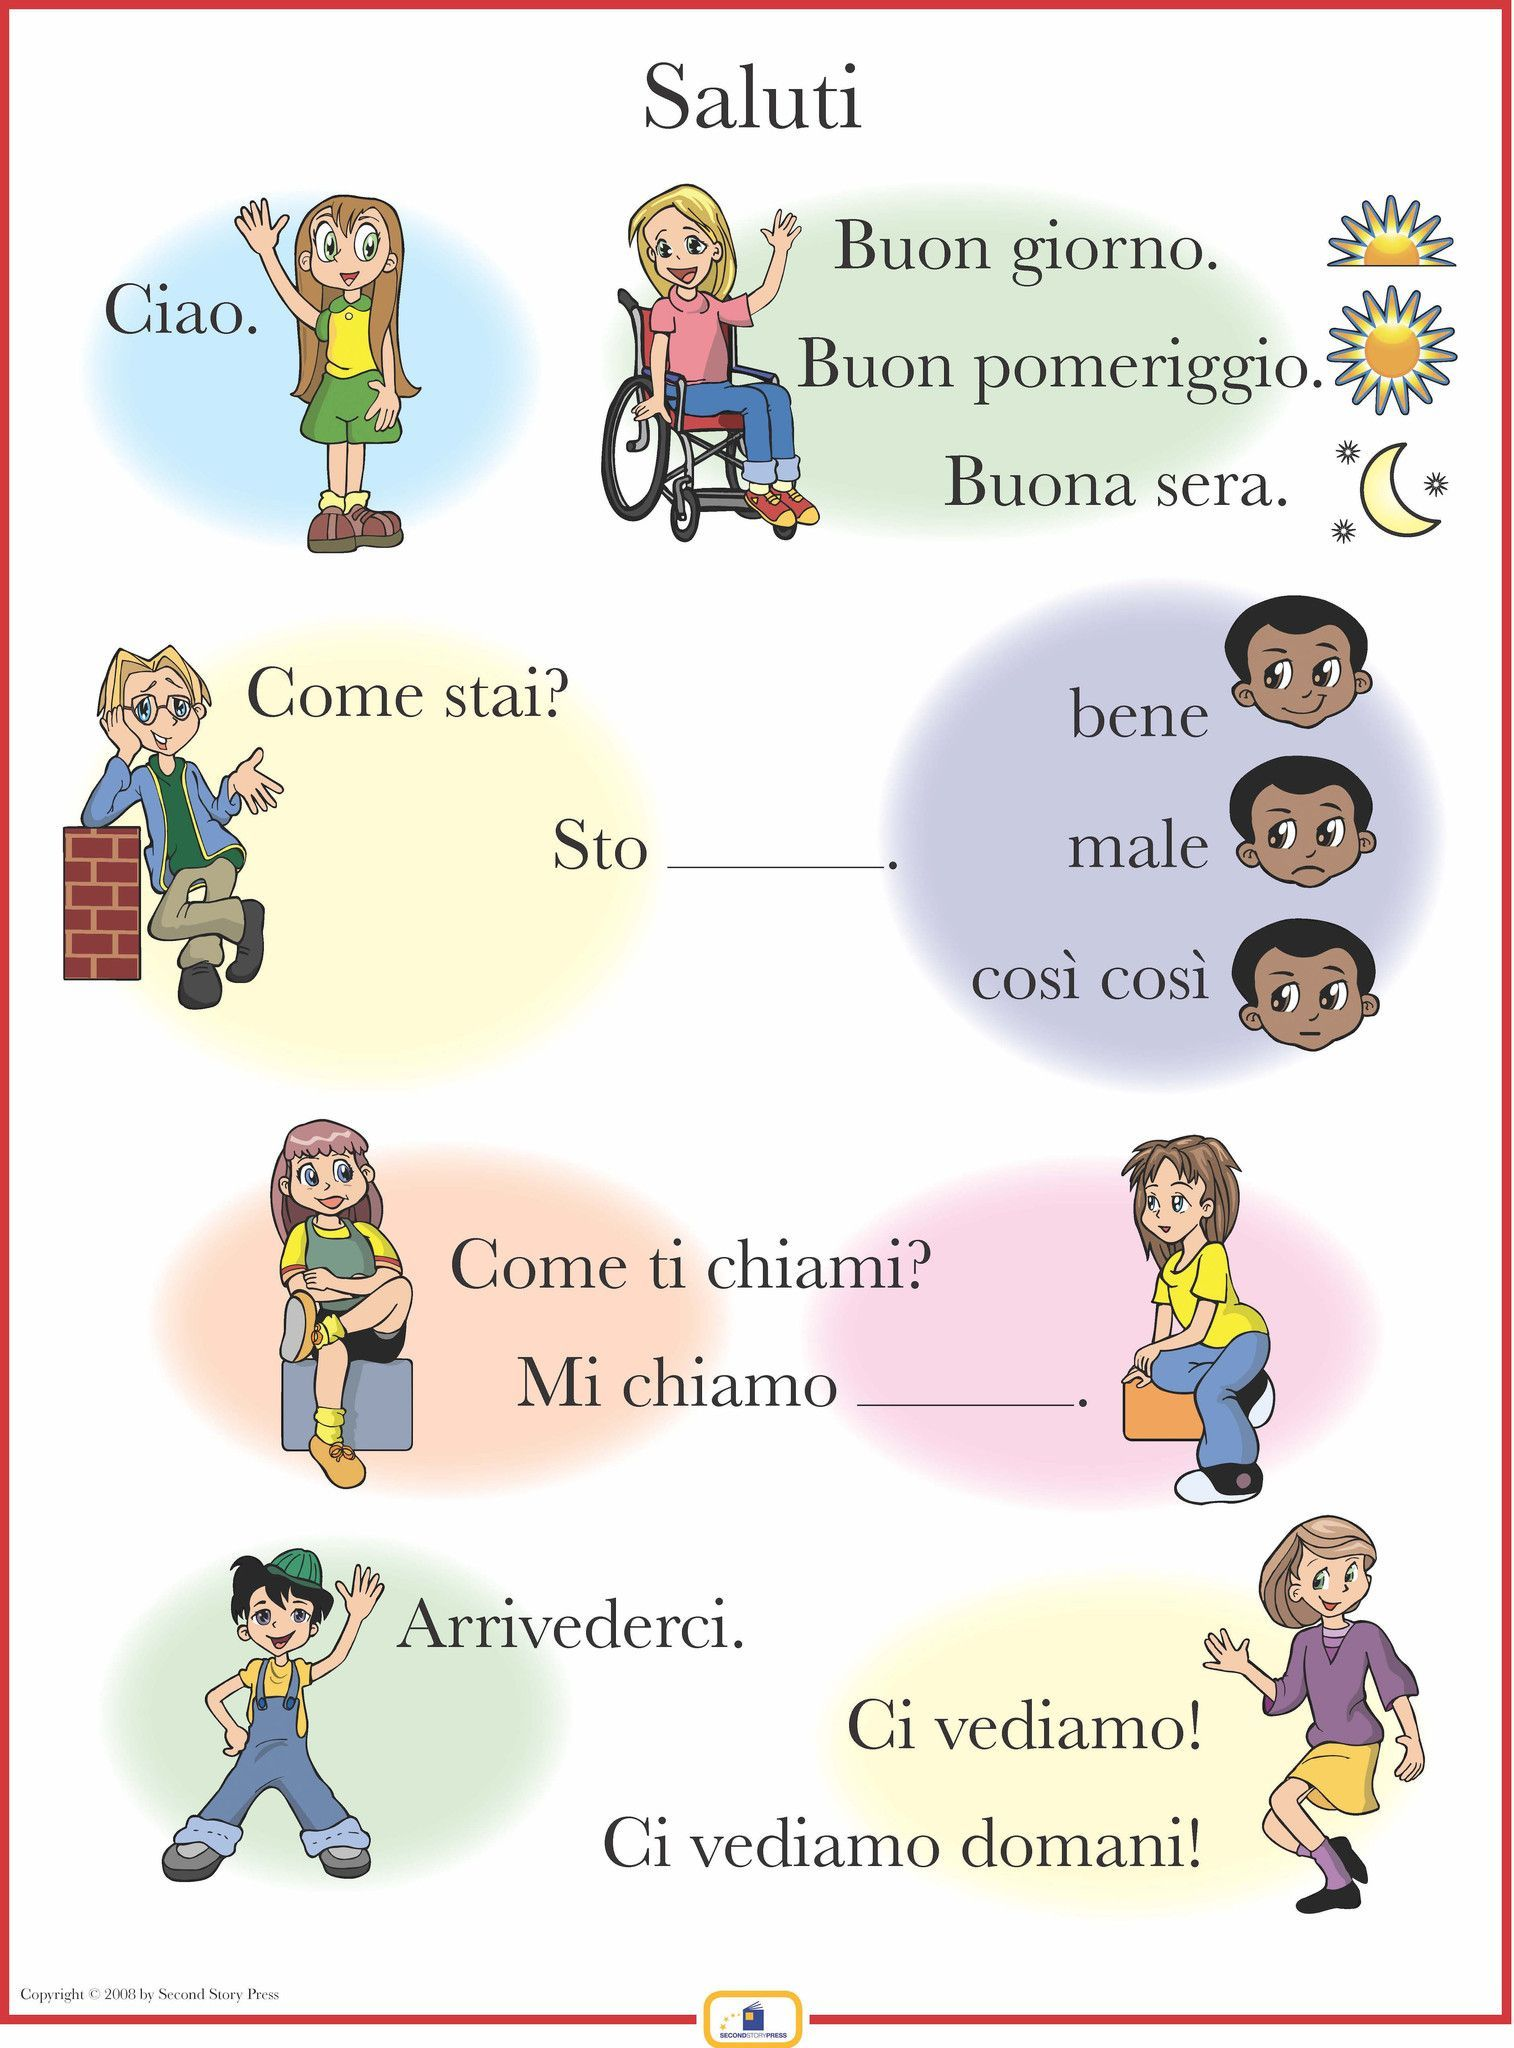 Italian Sign Language Love Italian Greetings Poster Italian